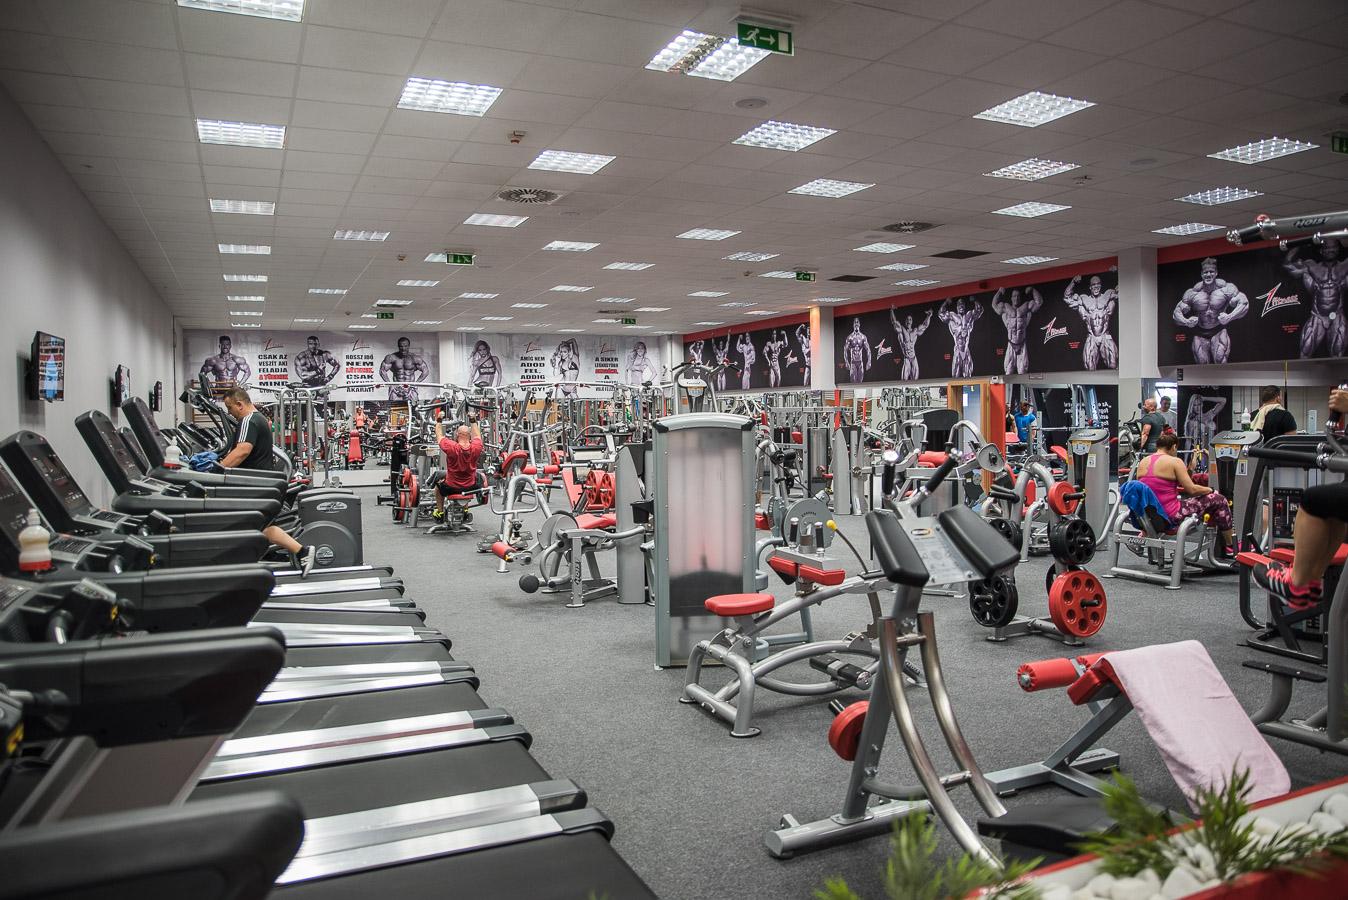 z1-fitness-terem-xvii-kerulet-rakosliget-020